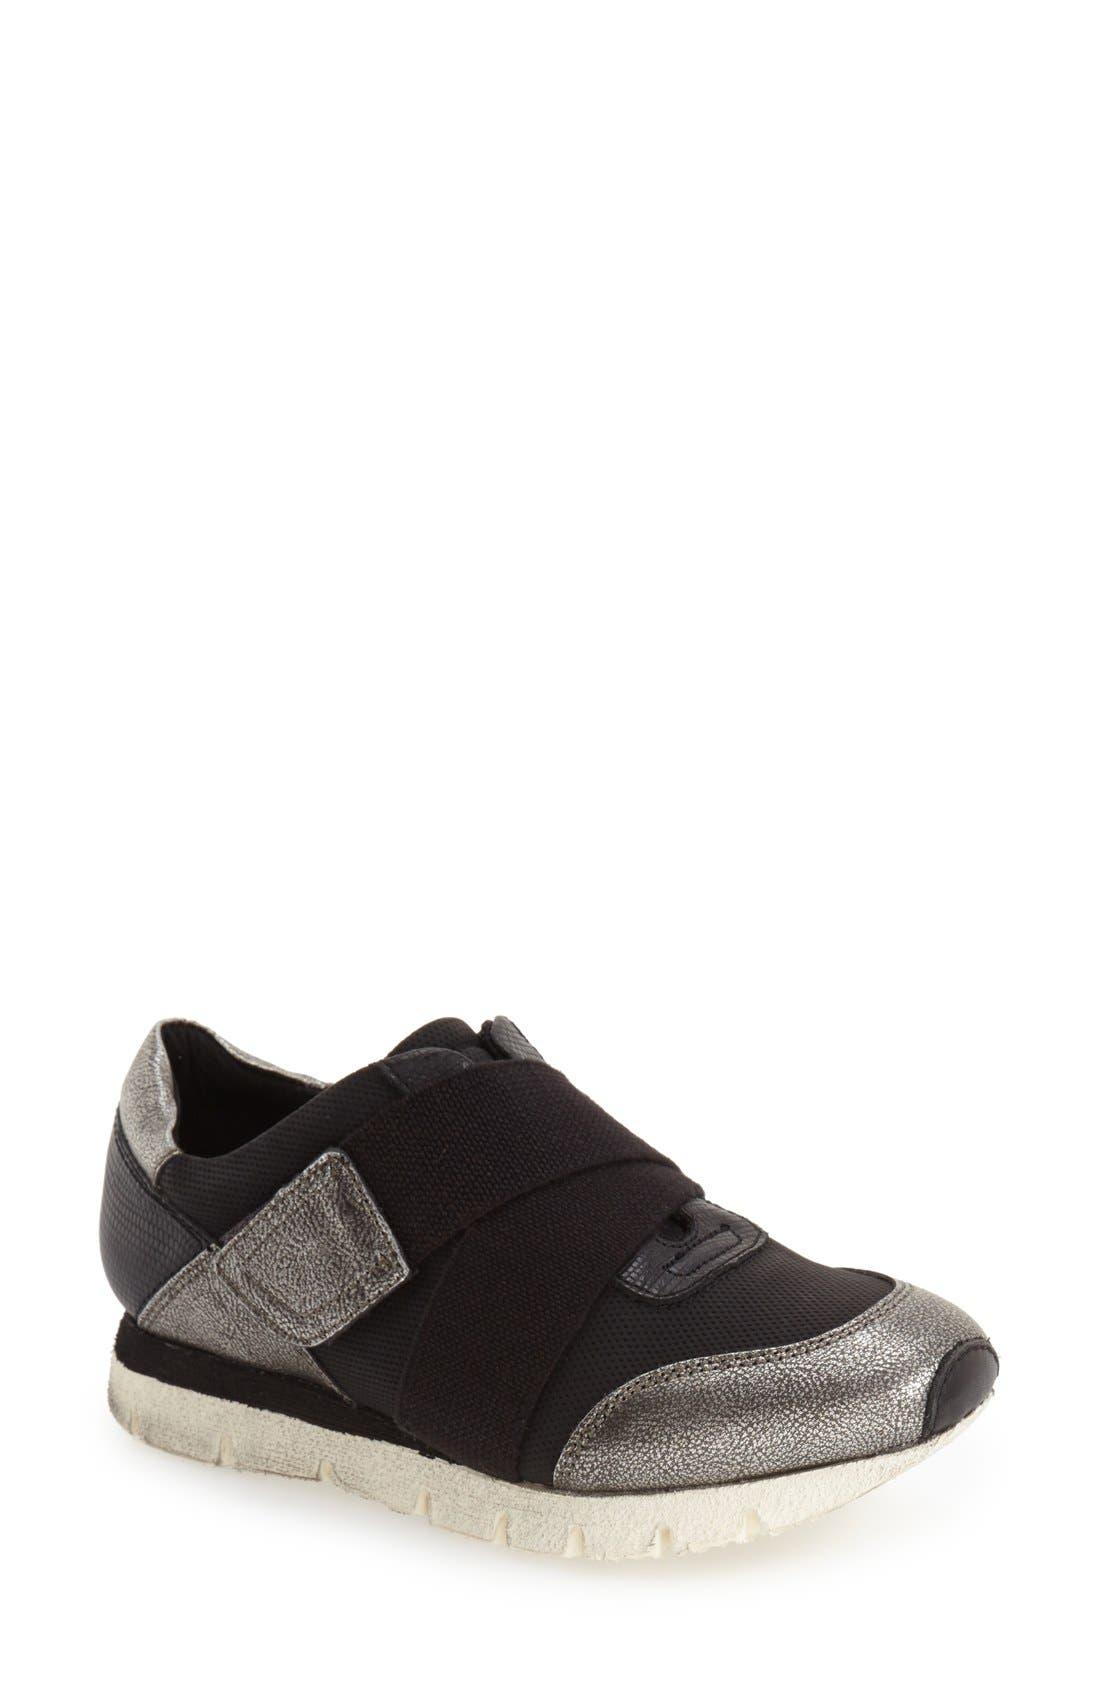 Main Image - OTBT 'New Wave' Sneaker (Women)